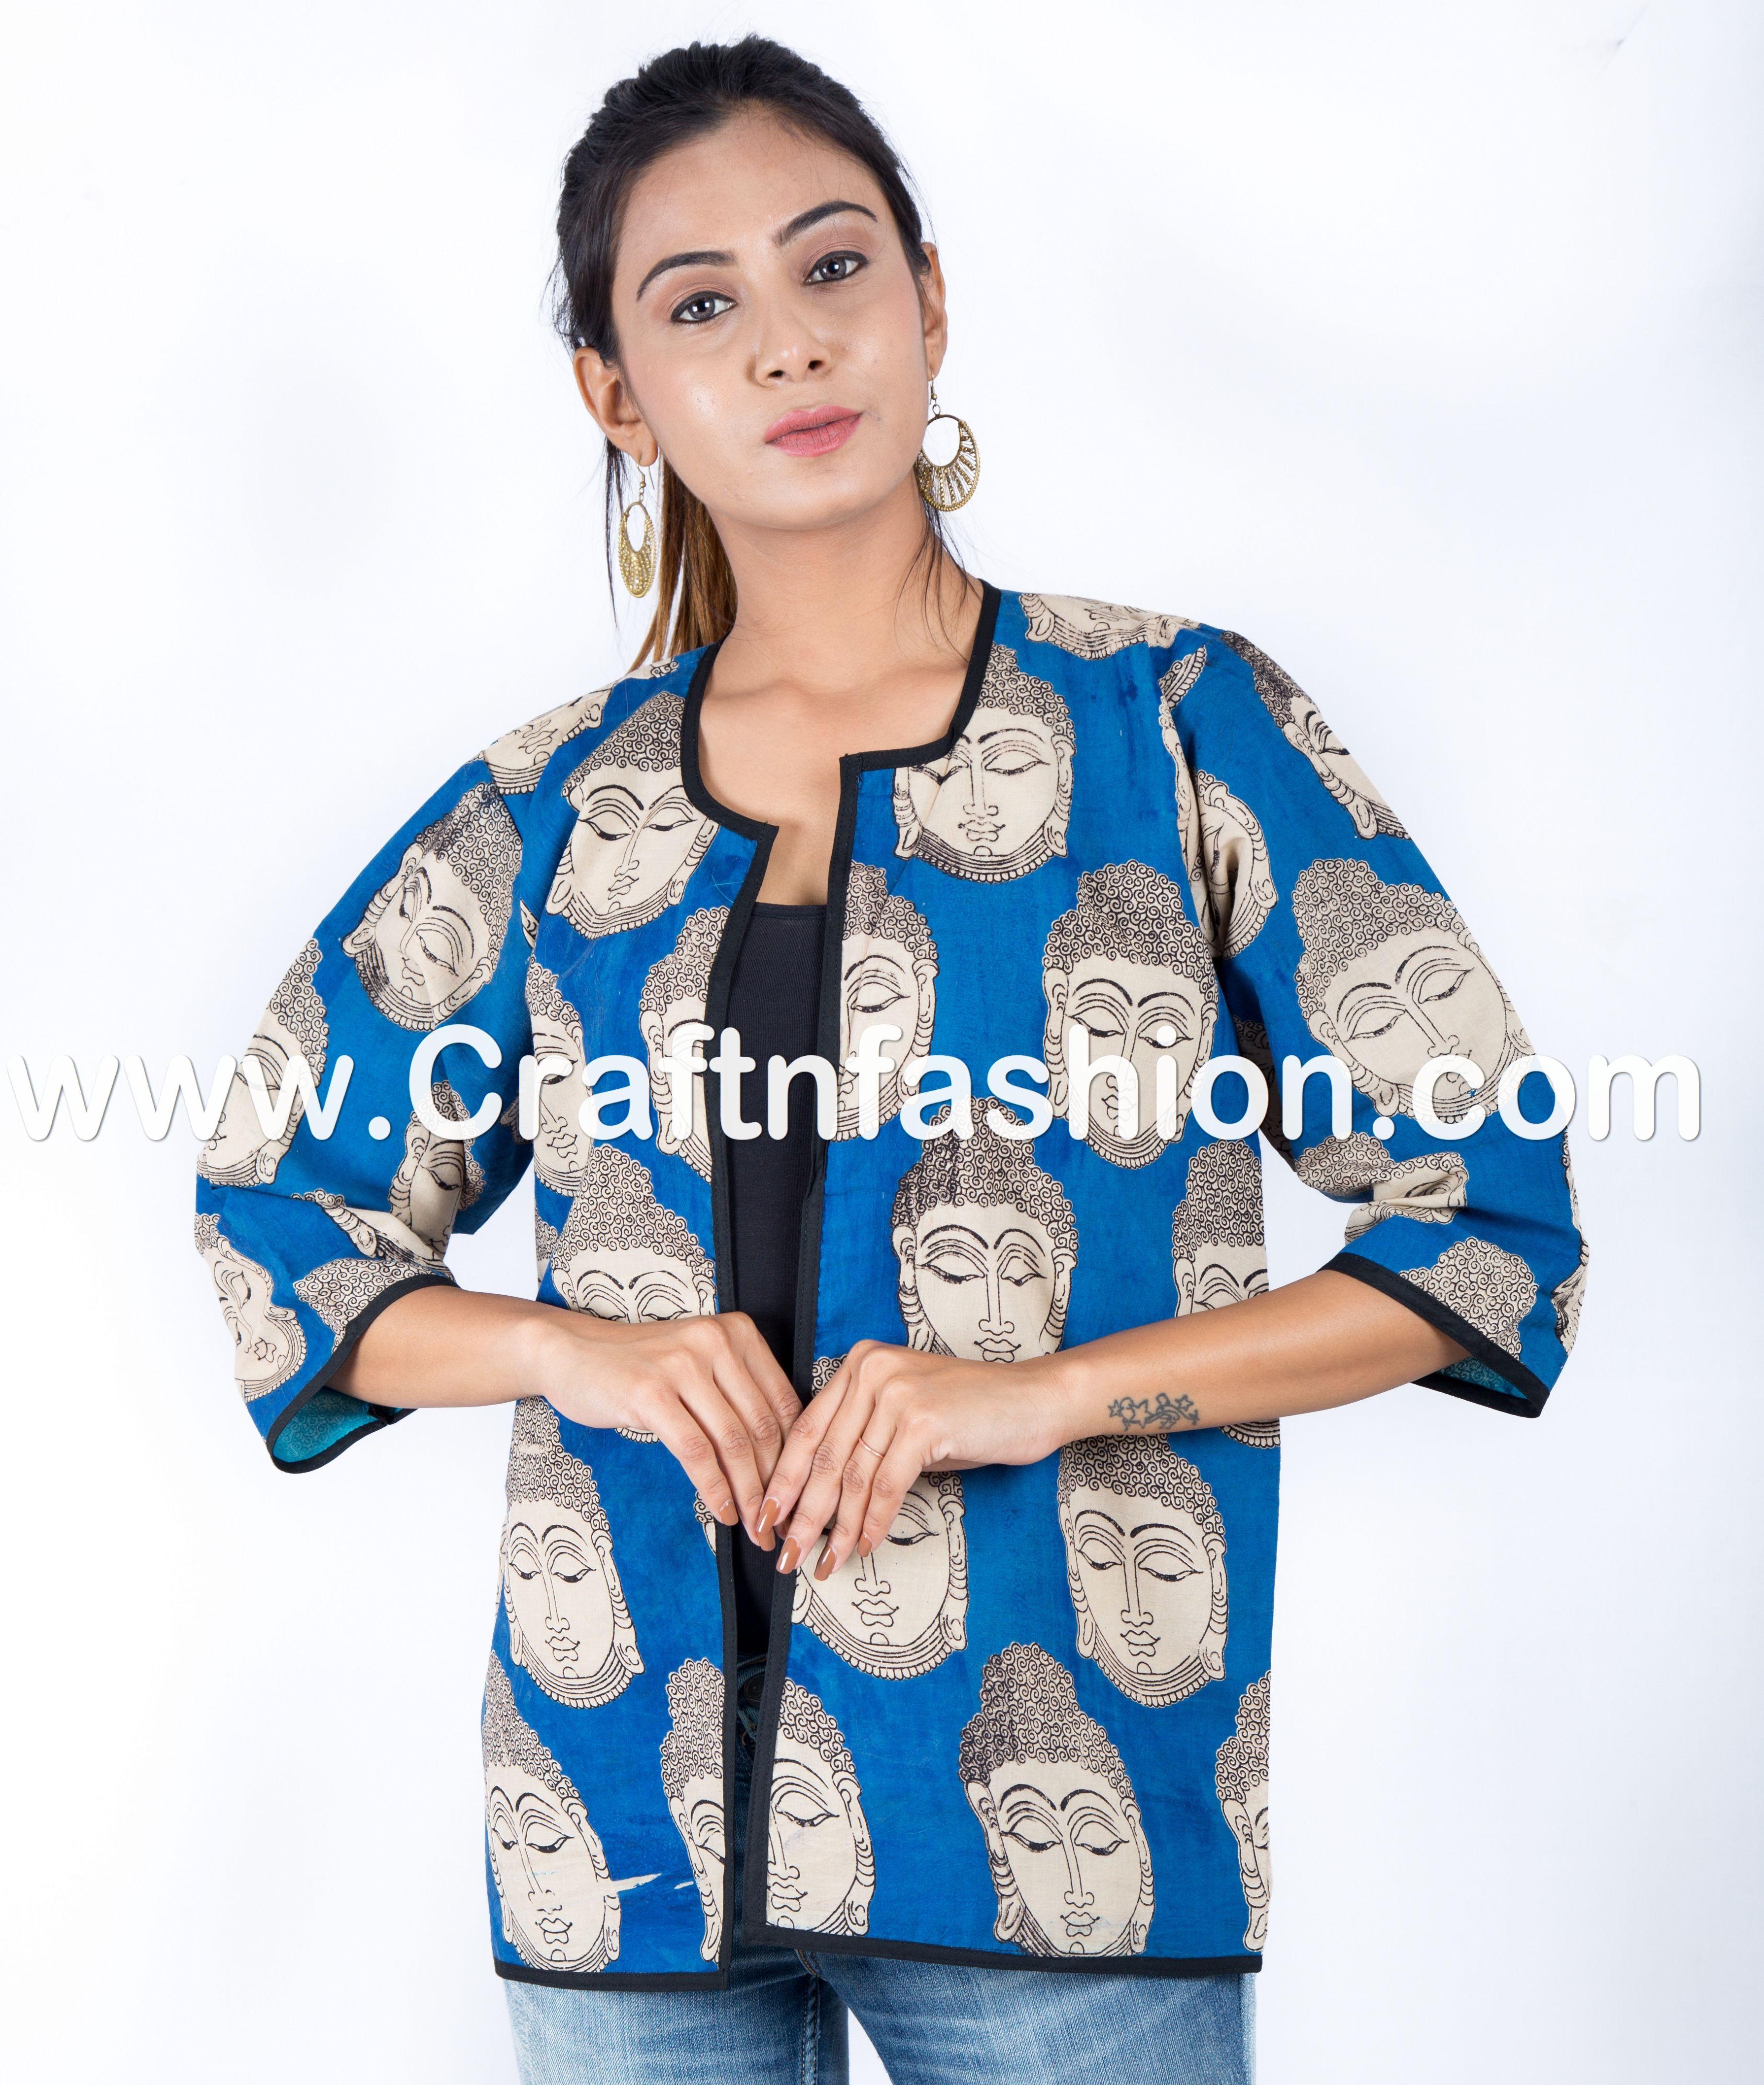 57202efb9 Kalamkari Print Buddha Style Gypsy-Banjara Boho Hippie-Indian Fashion  Wear-Tribal Designer Jacket